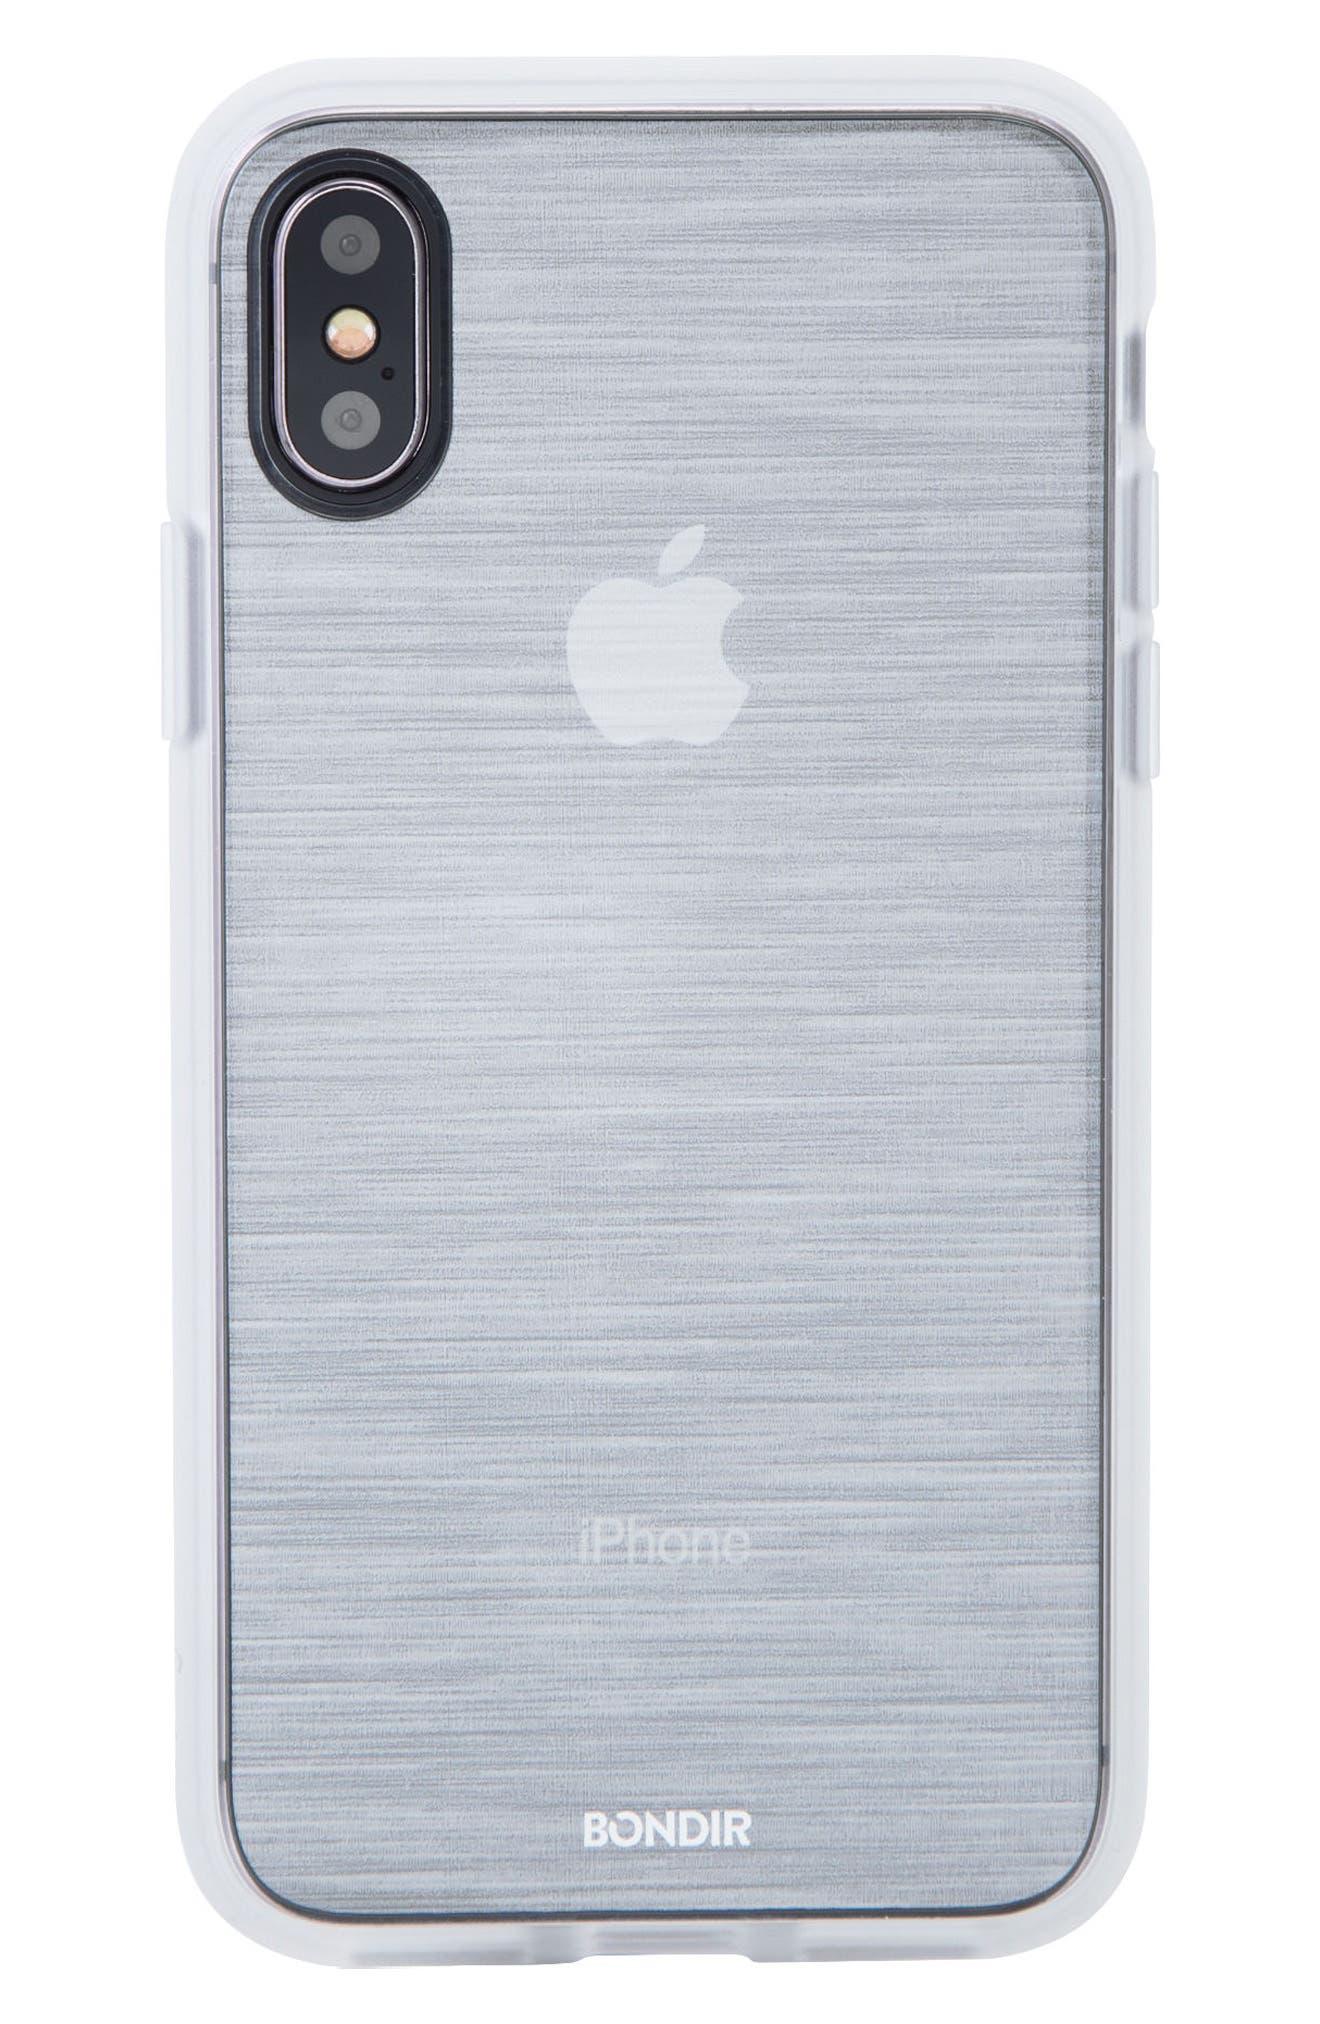 Bondir Mist iPhone X Plus Case